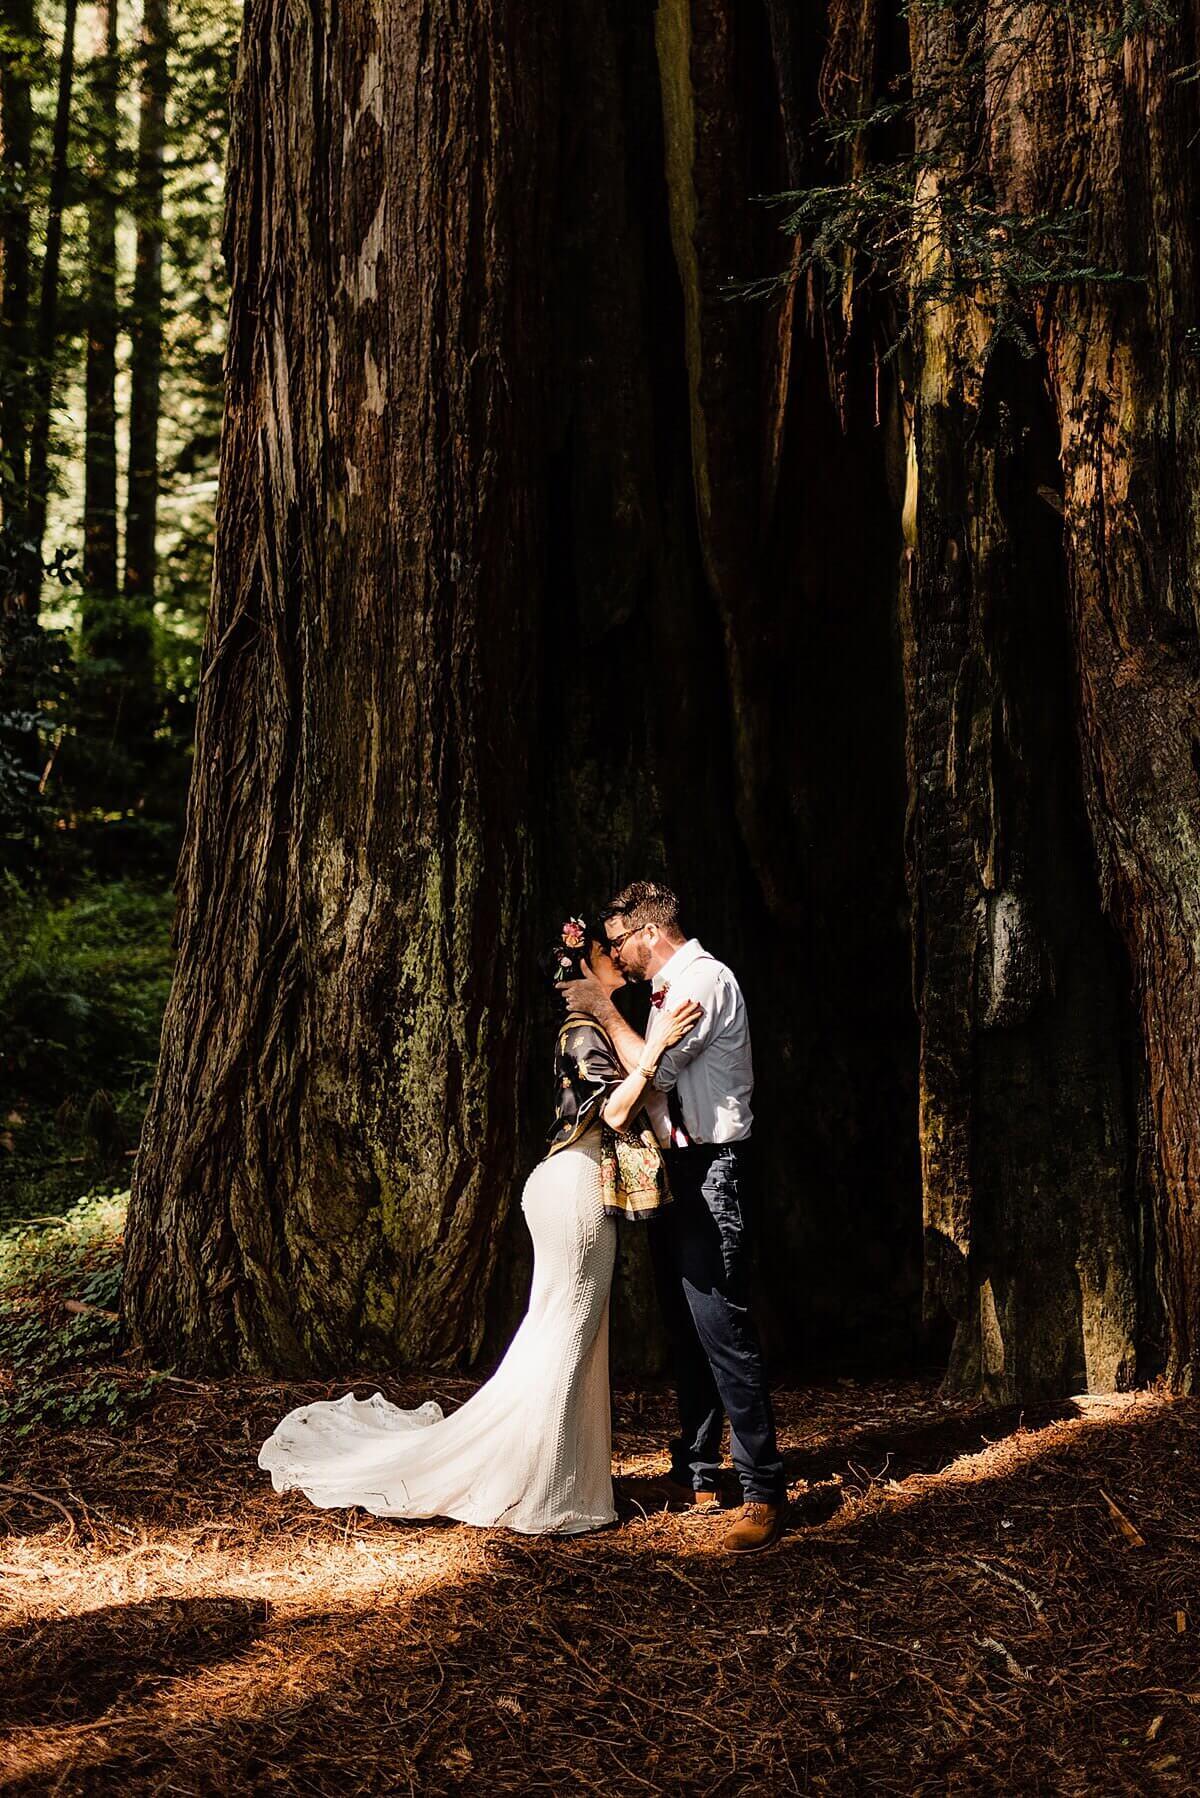 Allison-Brooks-Jedediah-Smiith-Redwoods-Adventure-Elopement-Wedding-S-Photography-Blog_0025.jpg